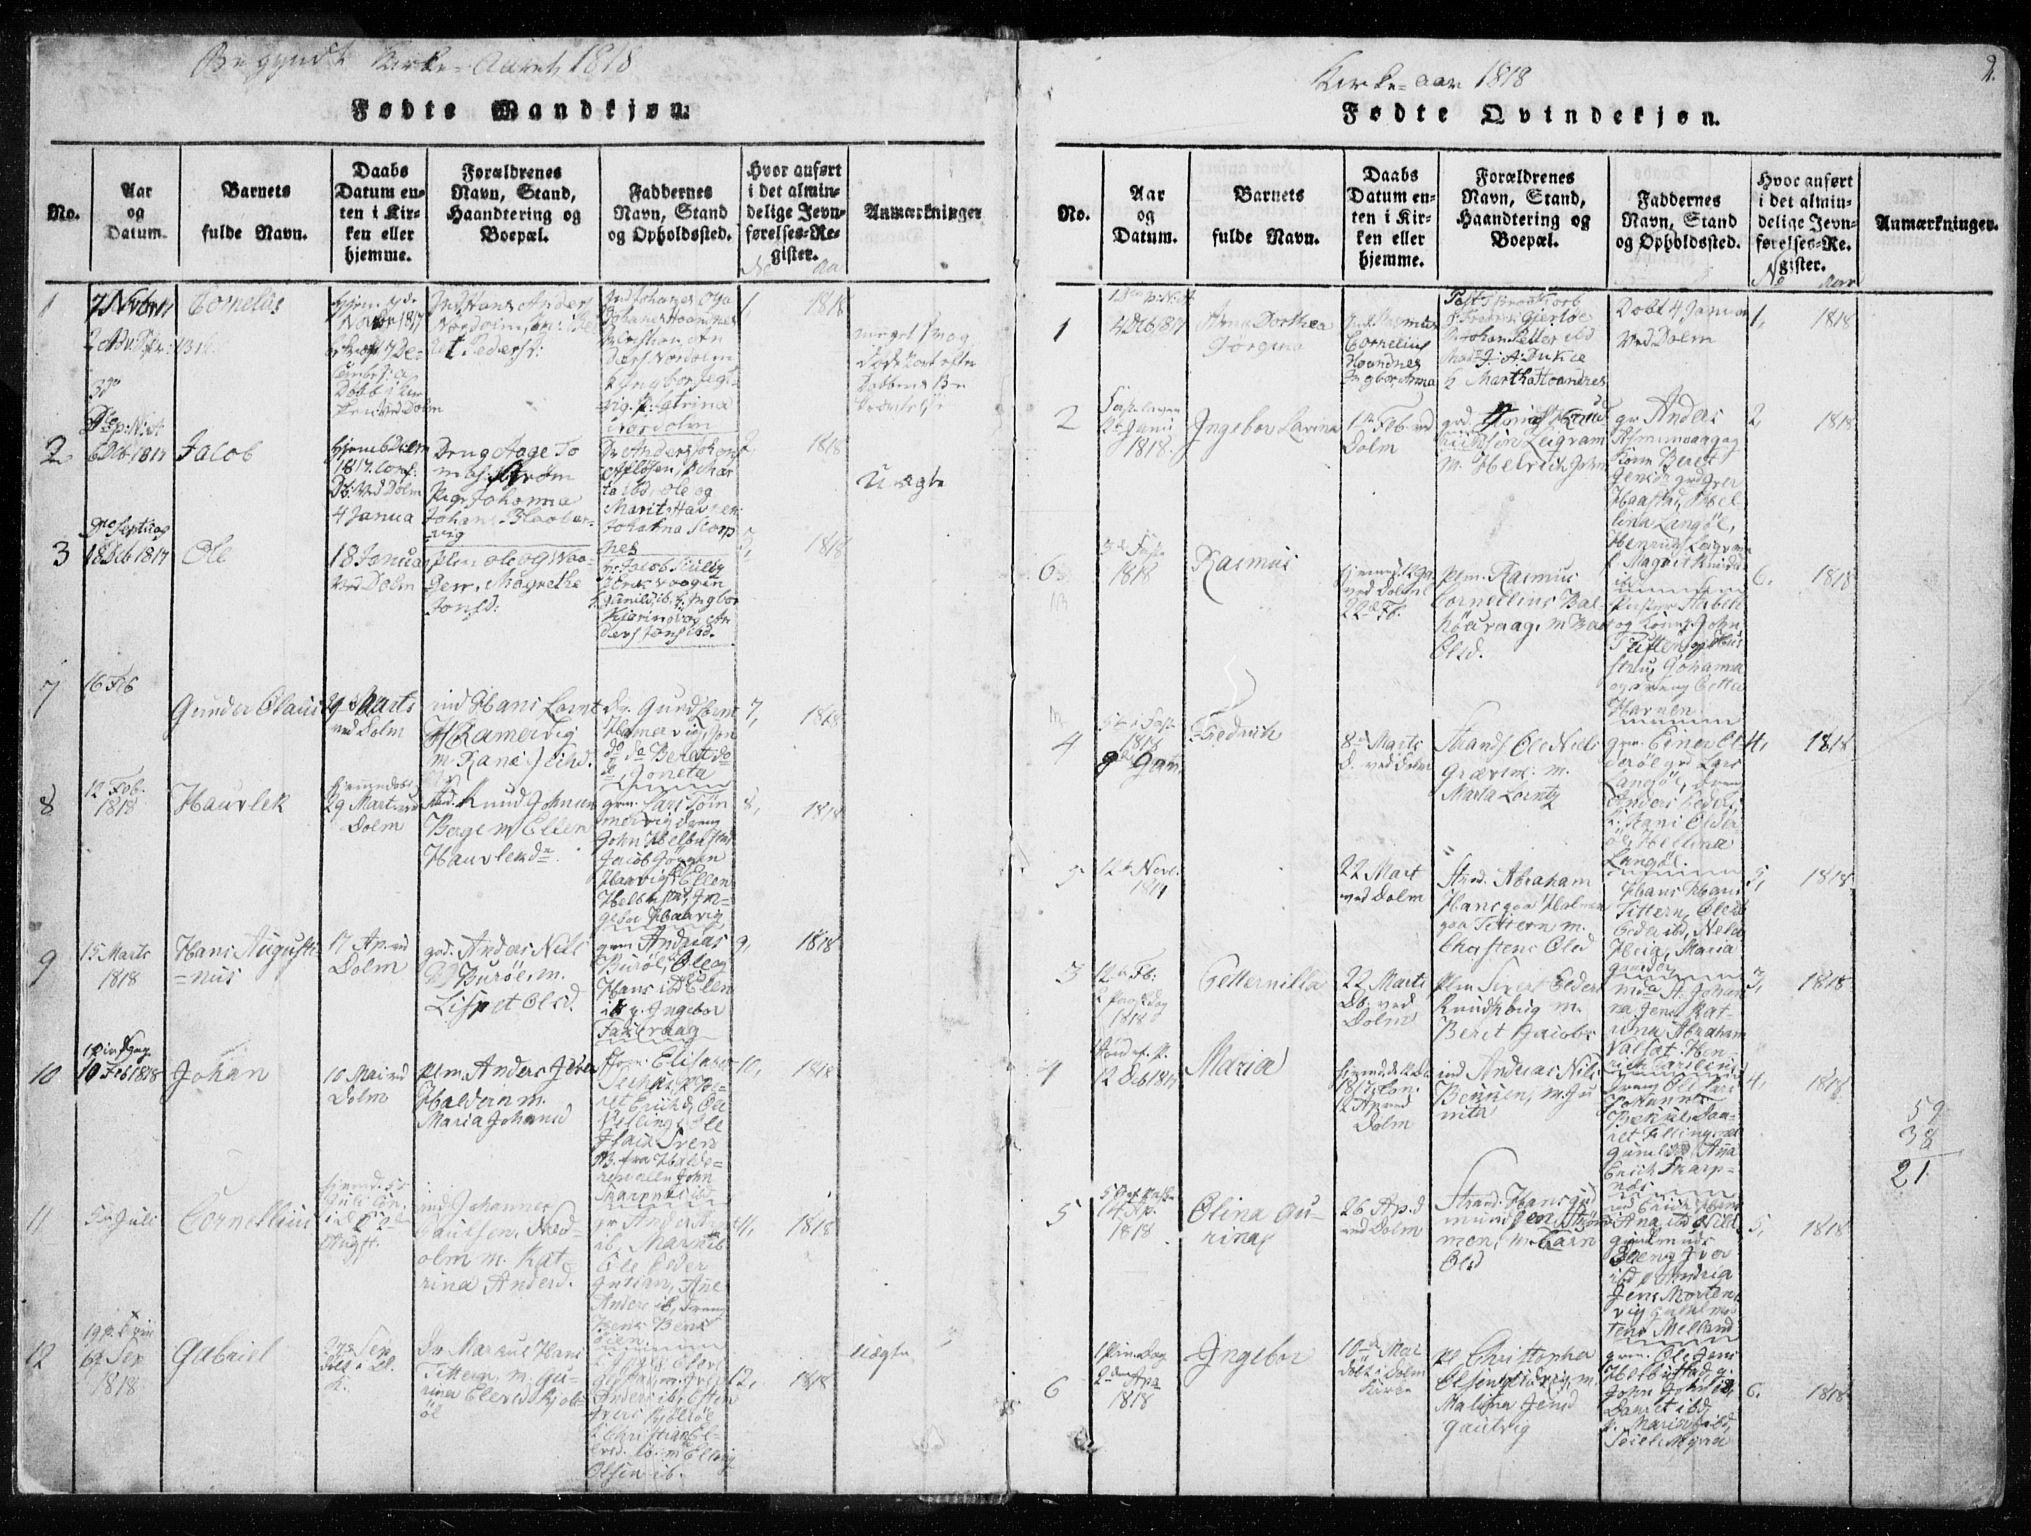 SAT, Ministerialprotokoller, klokkerbøker og fødselsregistre - Sør-Trøndelag, 634/L0527: Parish register (official) no. 634A03, 1818-1826, p. 2